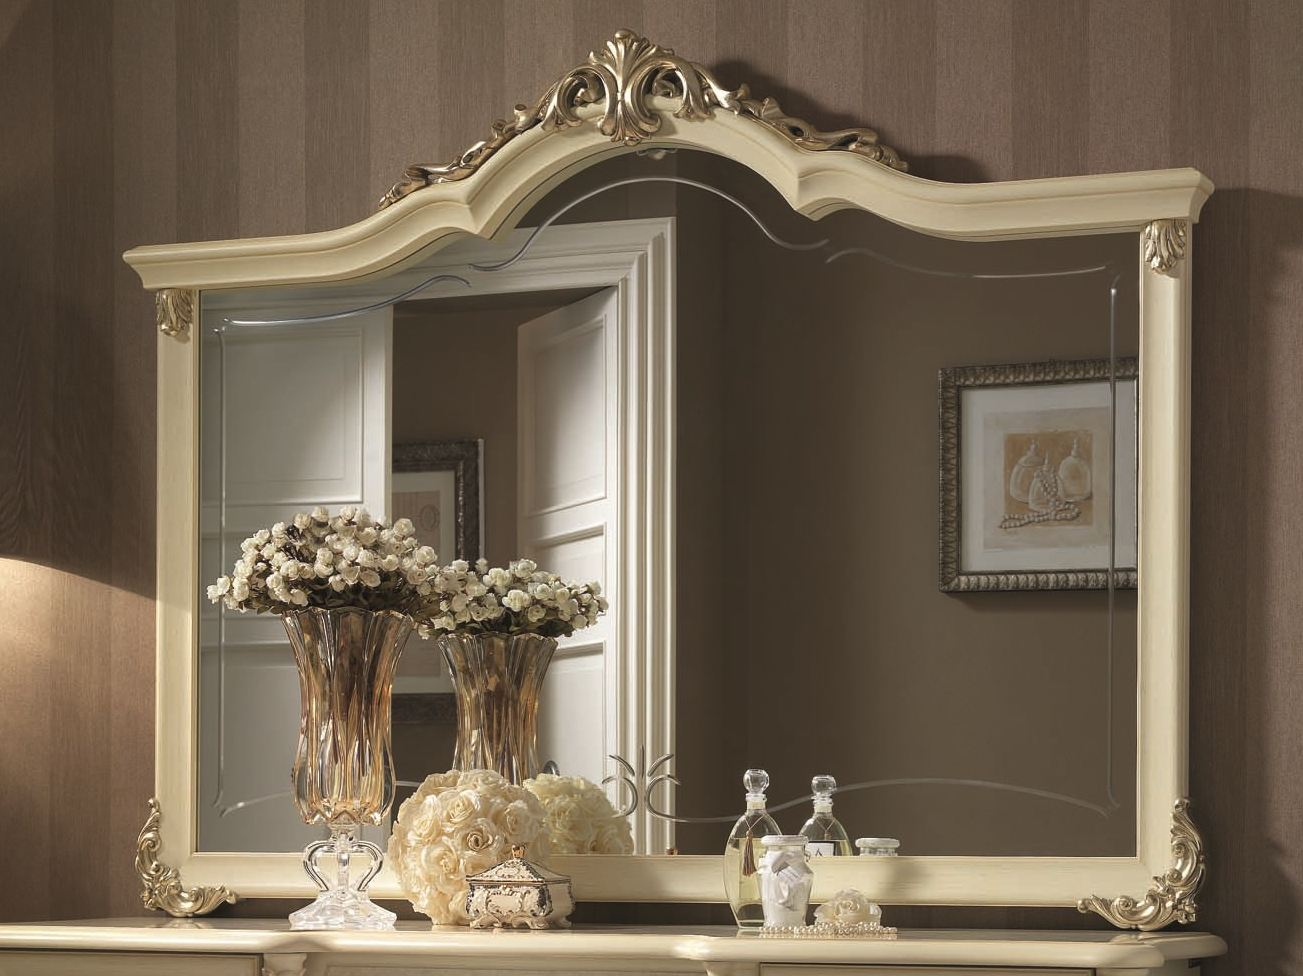 cadre photo miroir. Black Bedroom Furniture Sets. Home Design Ideas